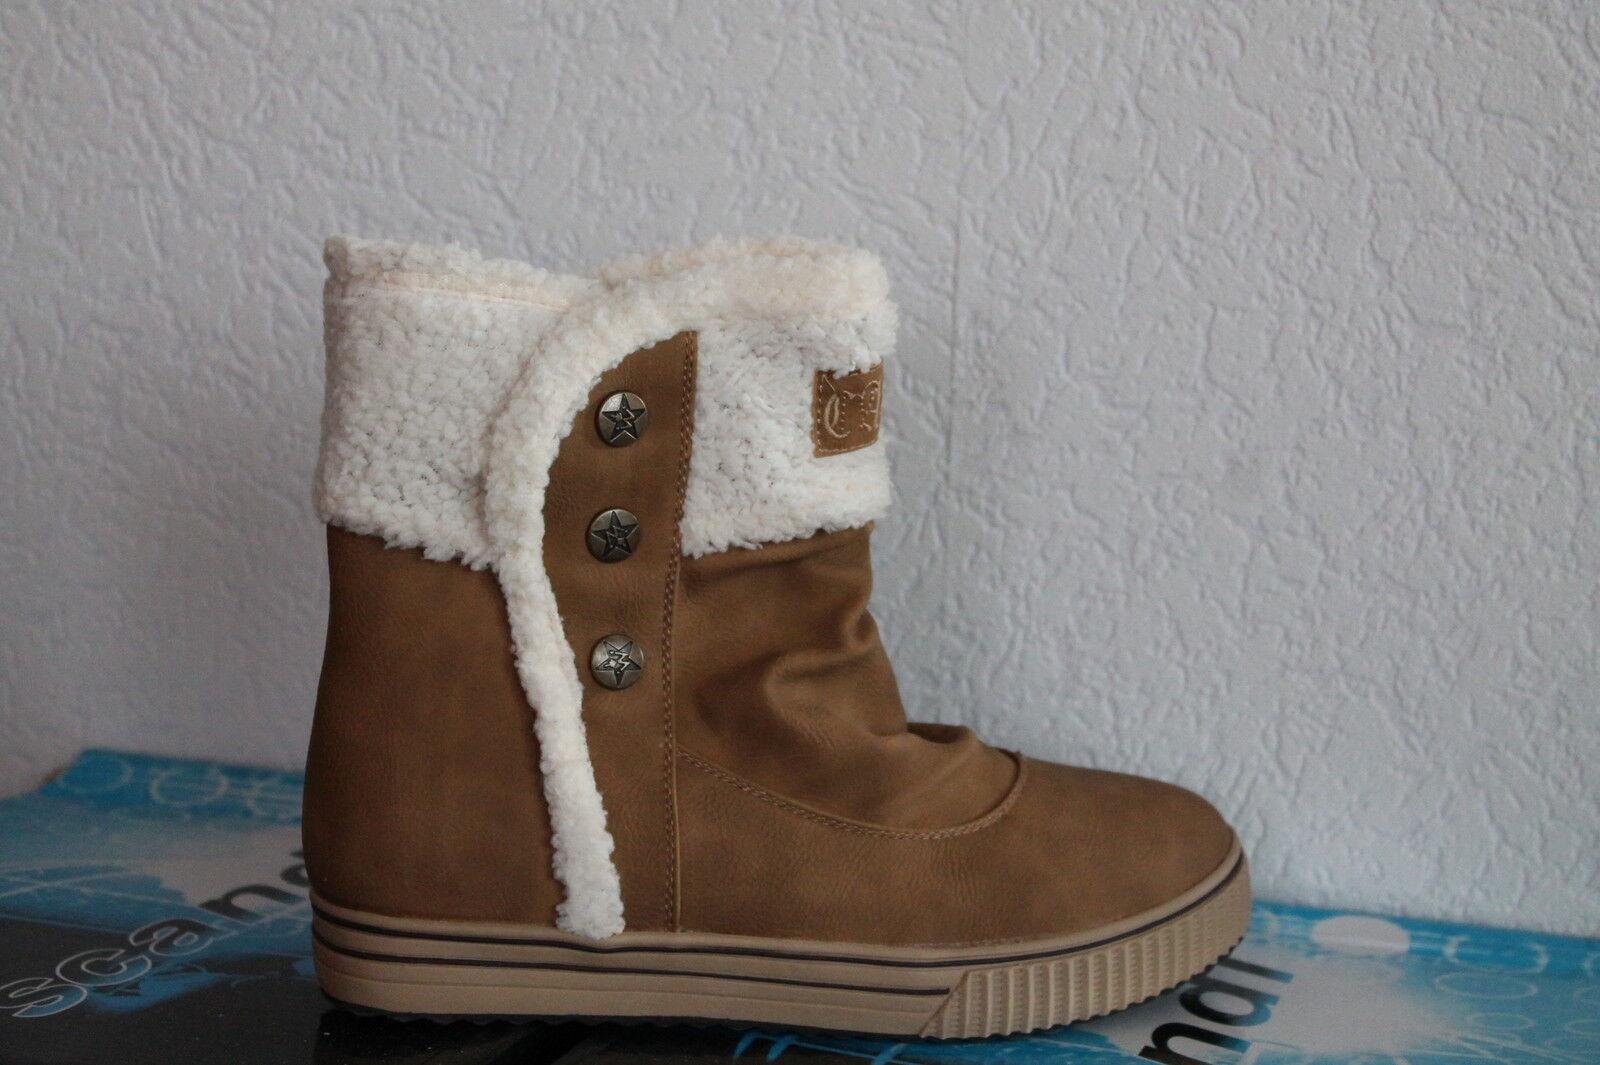 Damen Stiefeletten gefüttert  Winter Schuhe Stiefel gefüttert Stiefeletten Knöchelschuhe Fellrand b28ef4